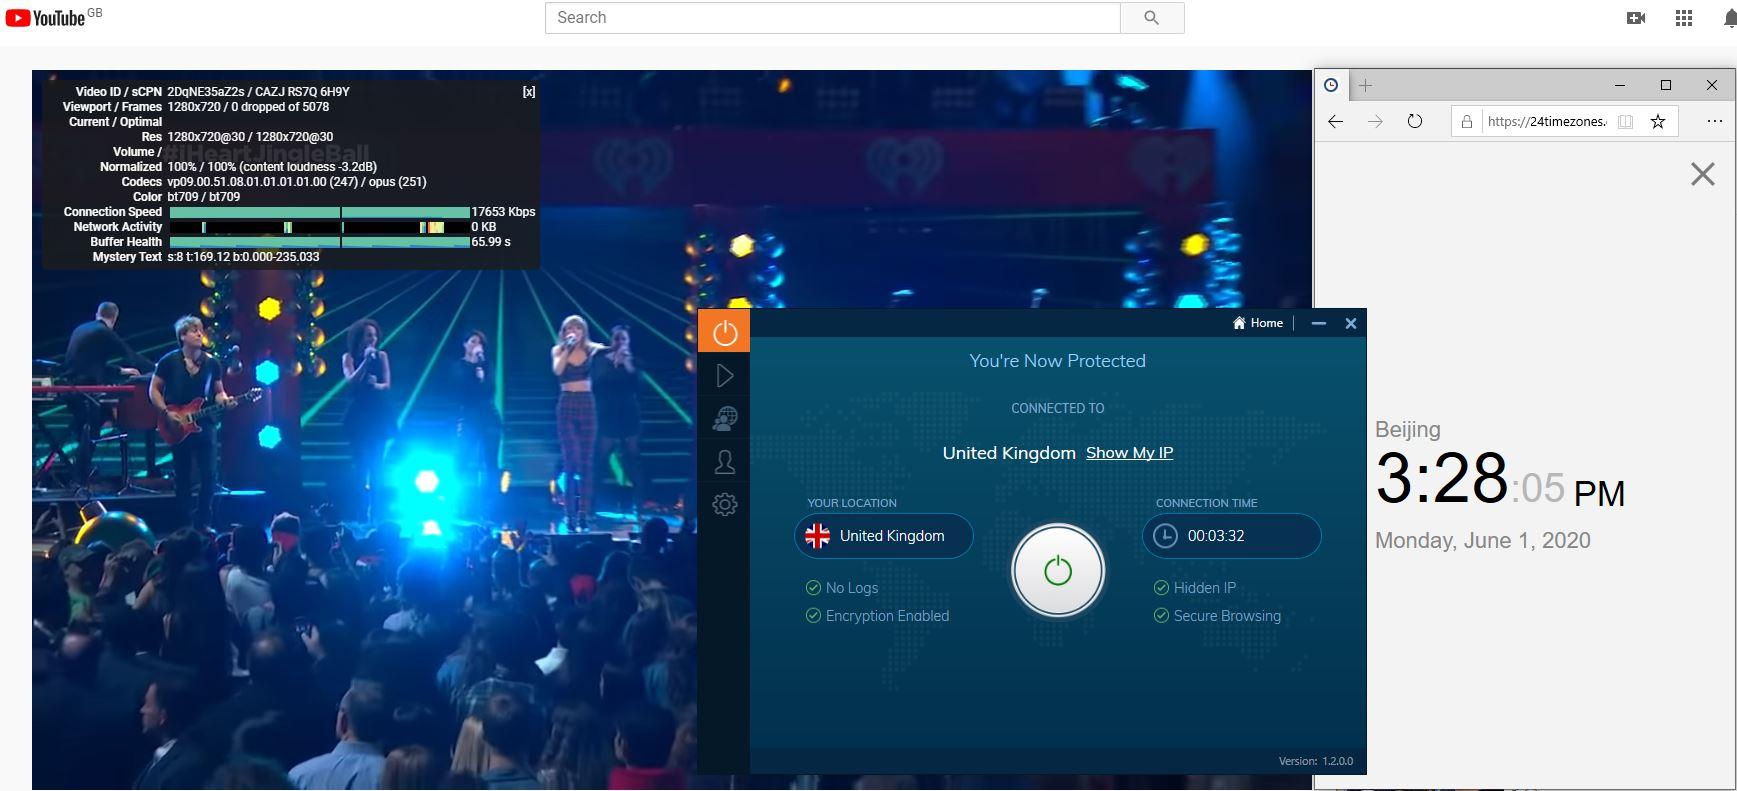 Windows10 IvacyVPN UK 中国VPN 翻墙 科学上网 测速-20200601